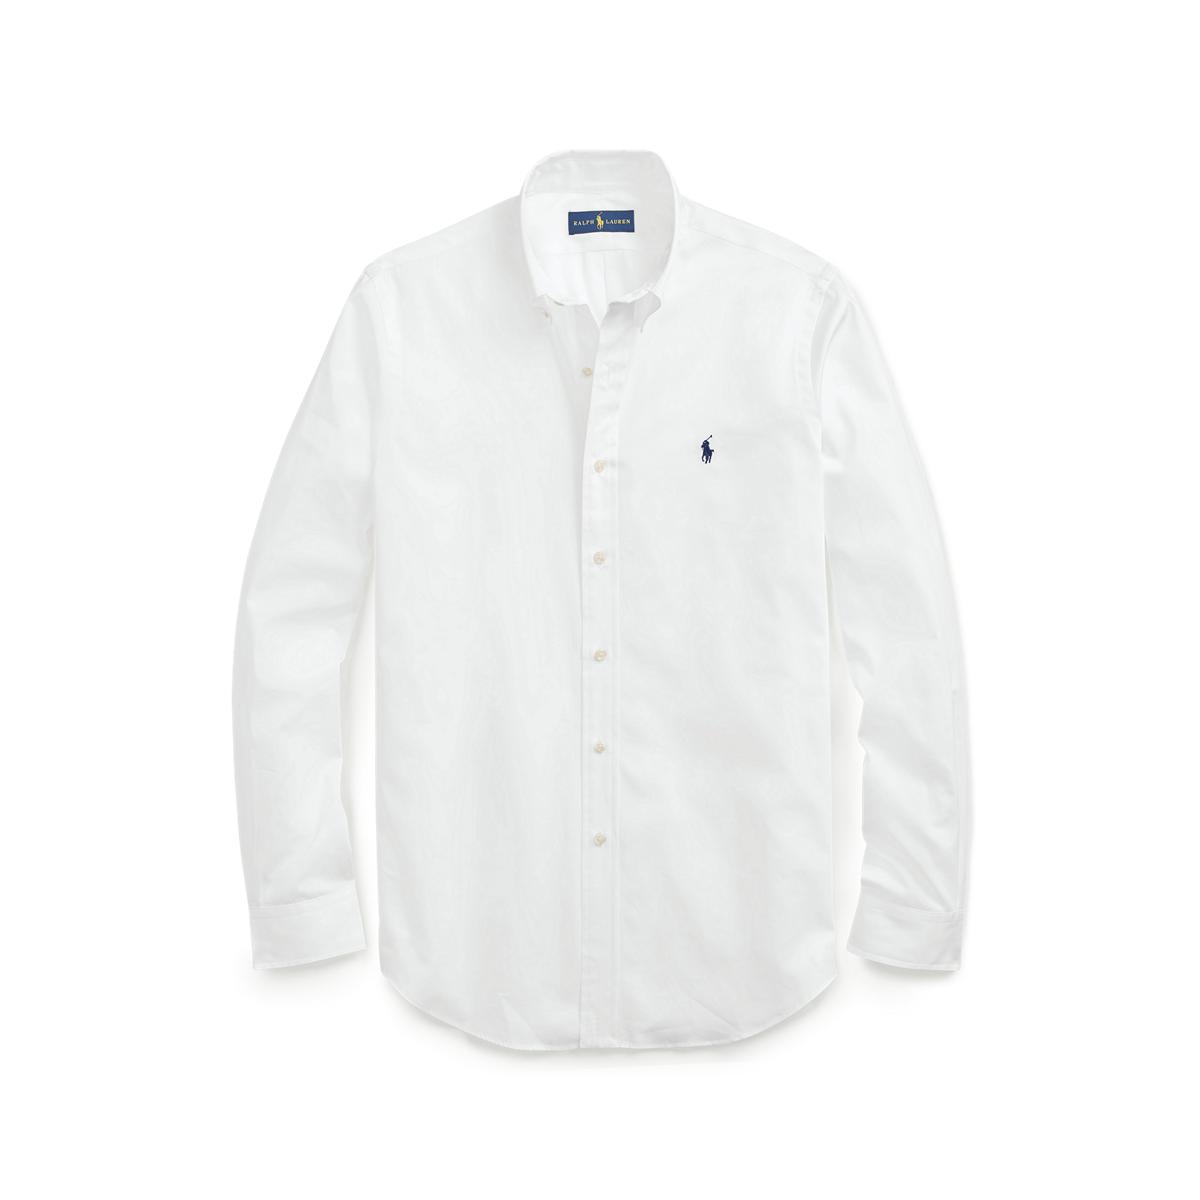 0f24f091d Classic Fit Cotton Shirt